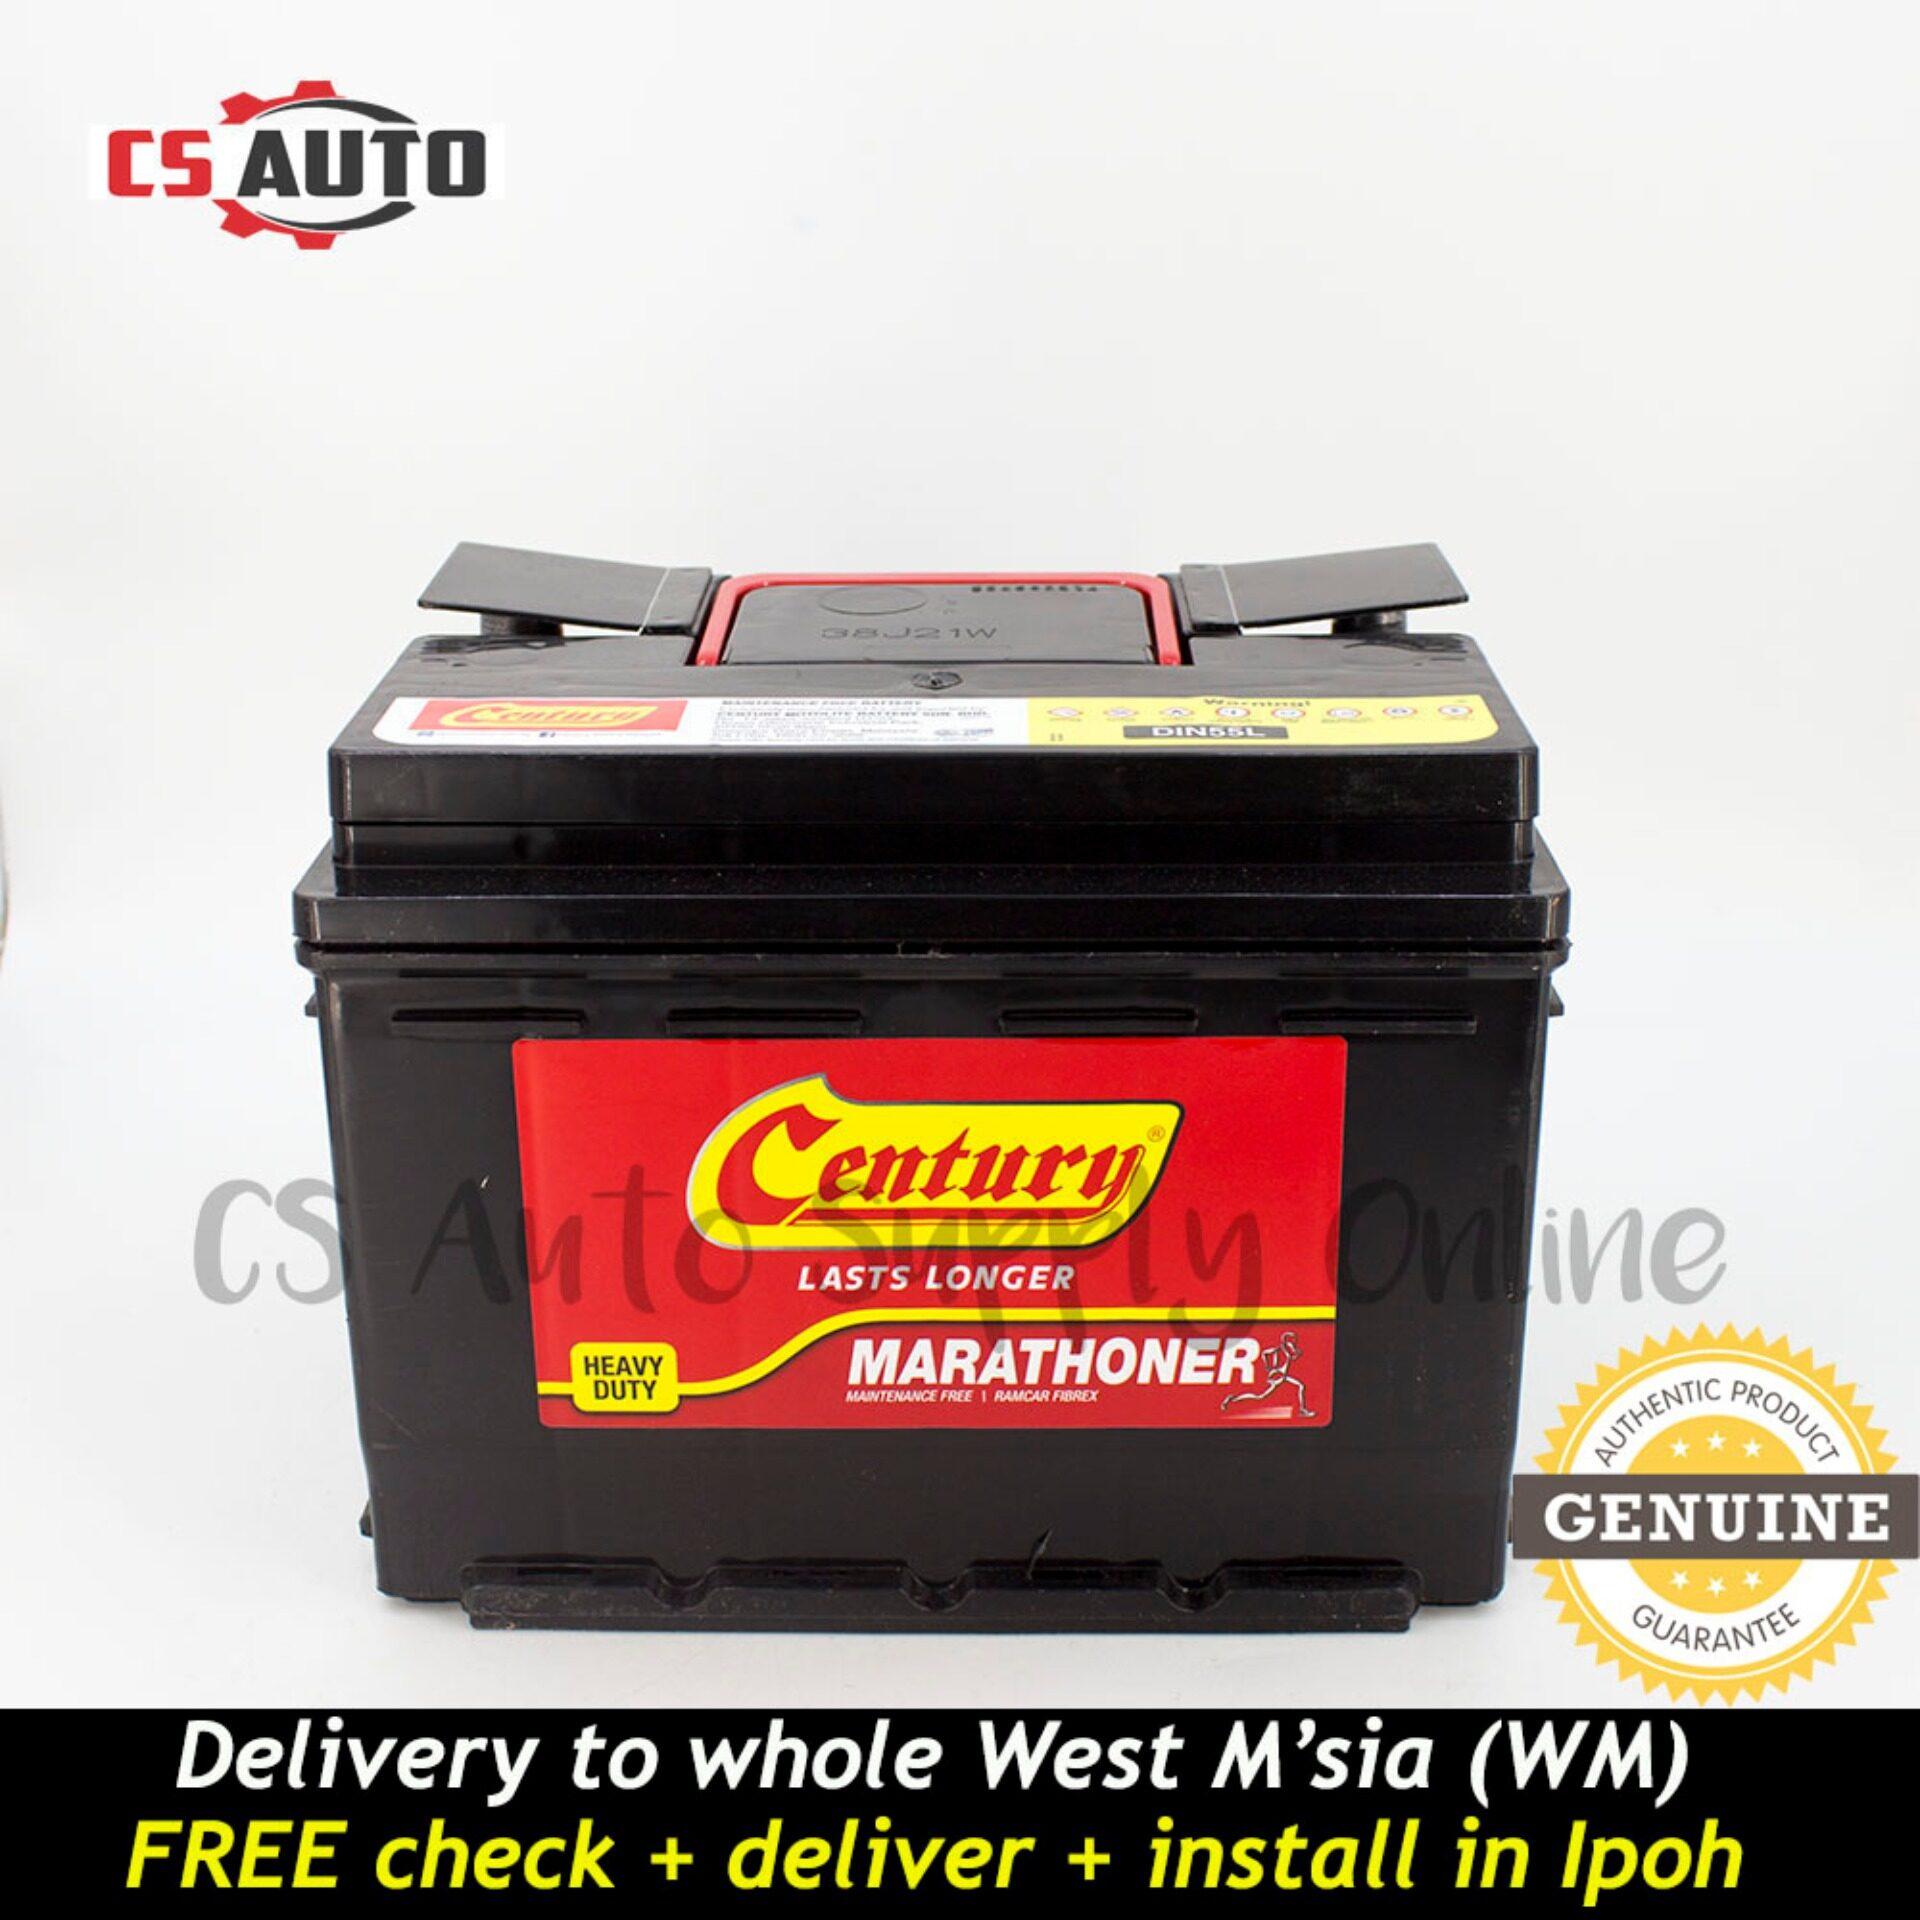 Century DIN55L Marathoner Battery MF DIN55 for Hyundai Elantra, Getz and Peugeot 3008, Alfa, Citreon C5, Kia Picanto, Naza Citra, VW Polo Ipoh (100% Original)